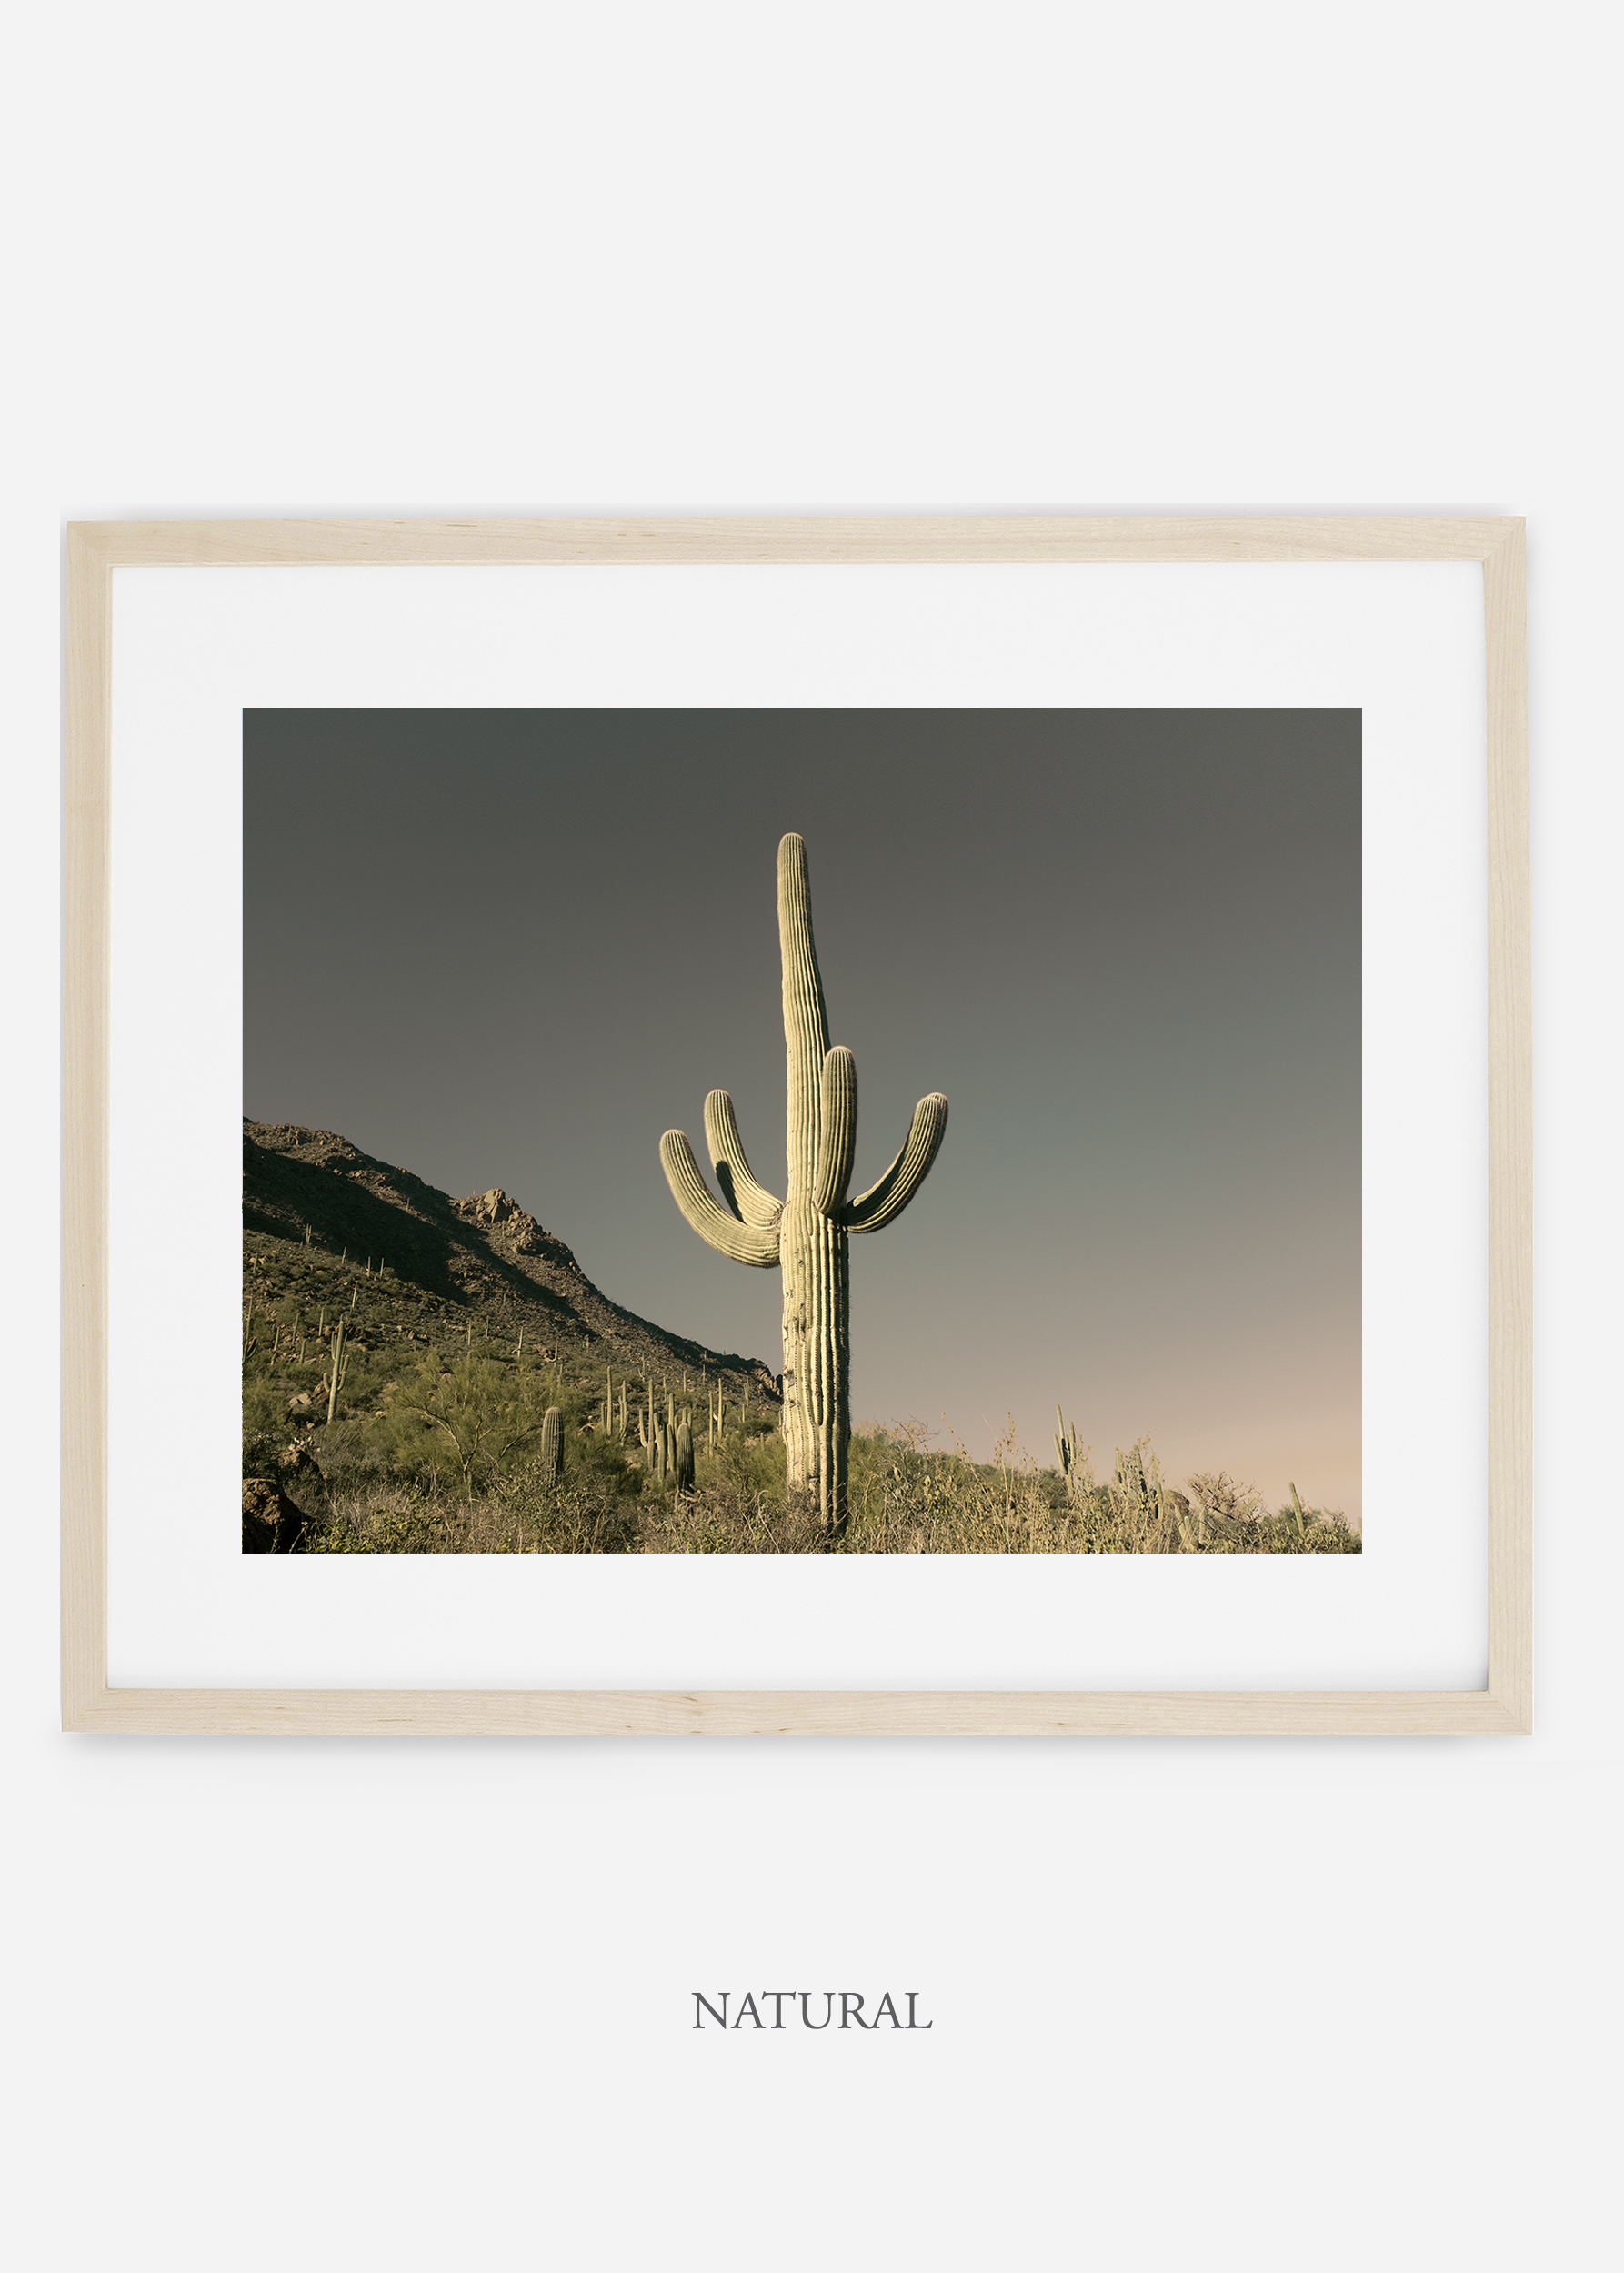 naturalframe-saguaroNo.19-wildercalifornia-art-wallart-cactusprint-homedecor-prints-arizona-botanical-artwork-interiordesign.jpg